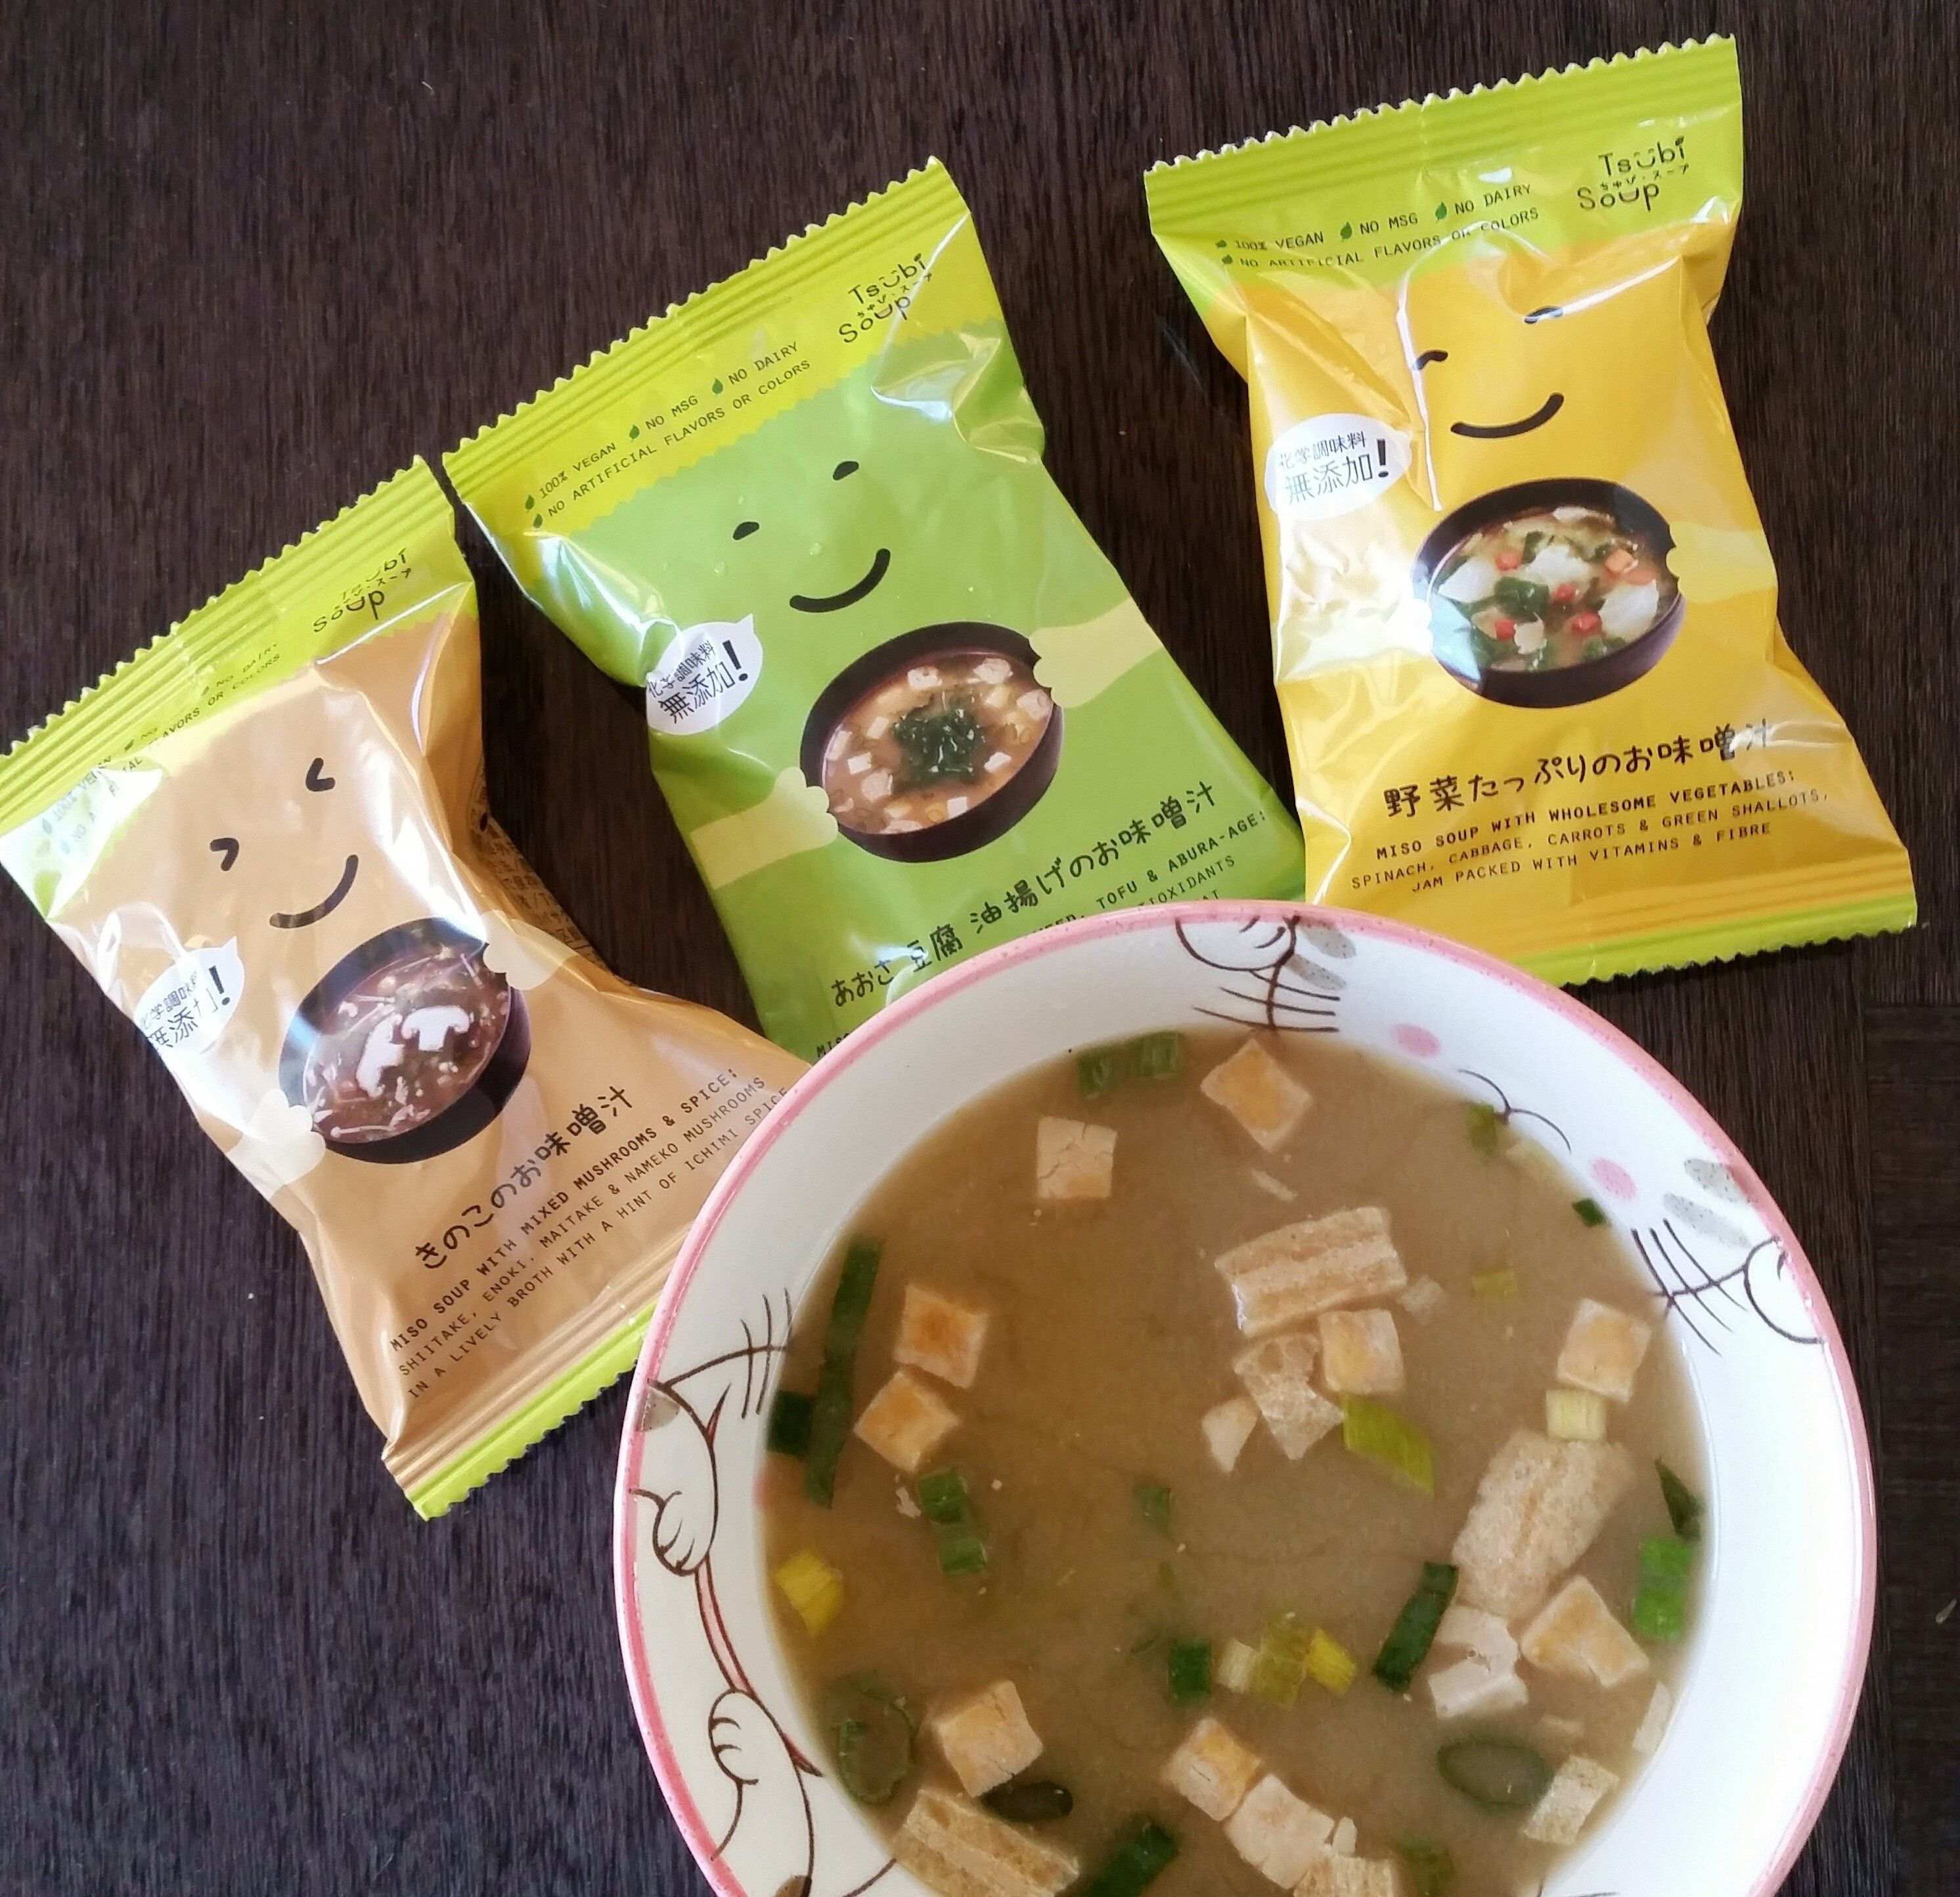 FREE Tsubi Miso Soup FreebieFriday Coupons